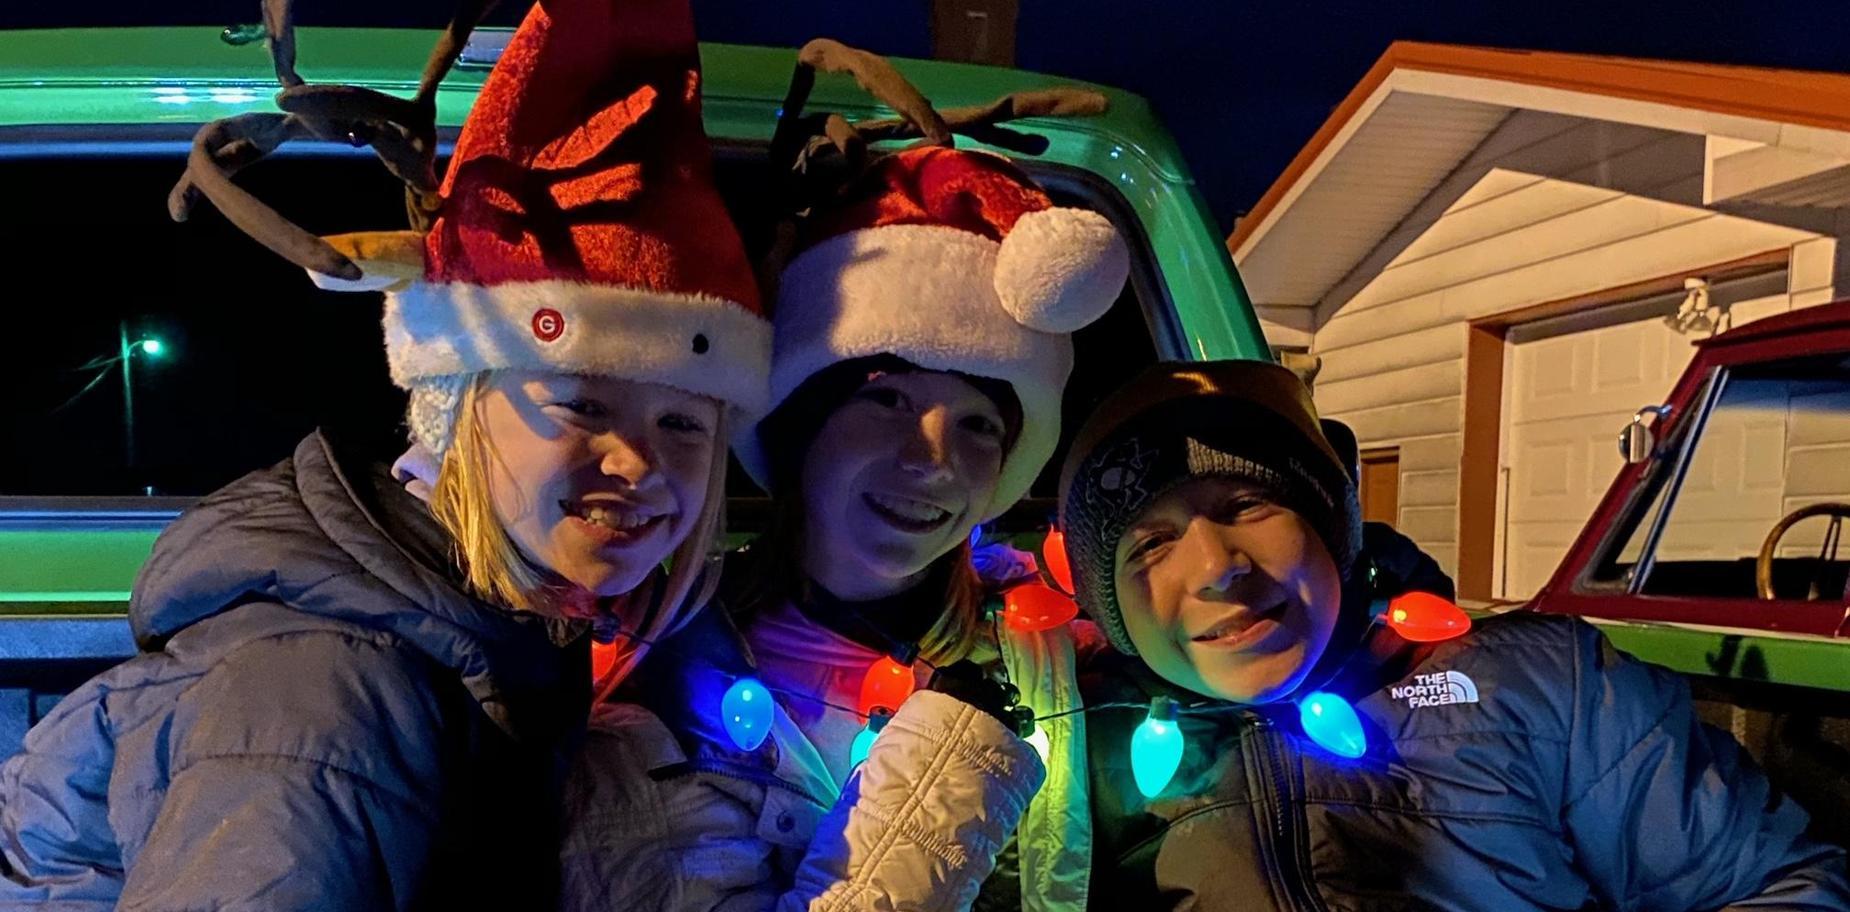 kids in holiday attire